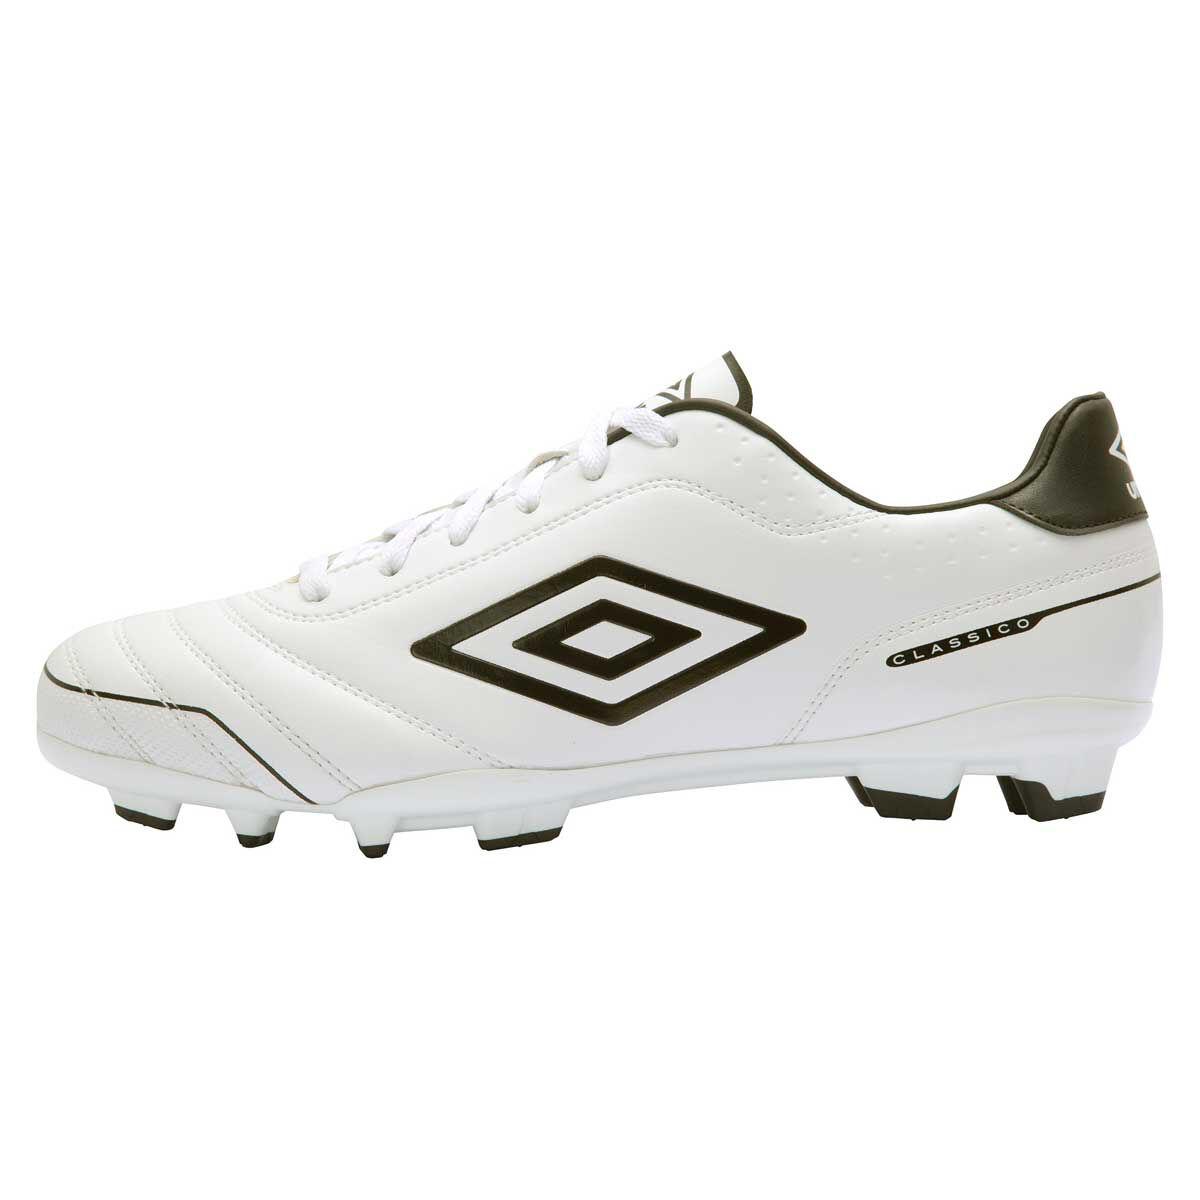 Umbro Classico 3 Mens FG Football Boots  